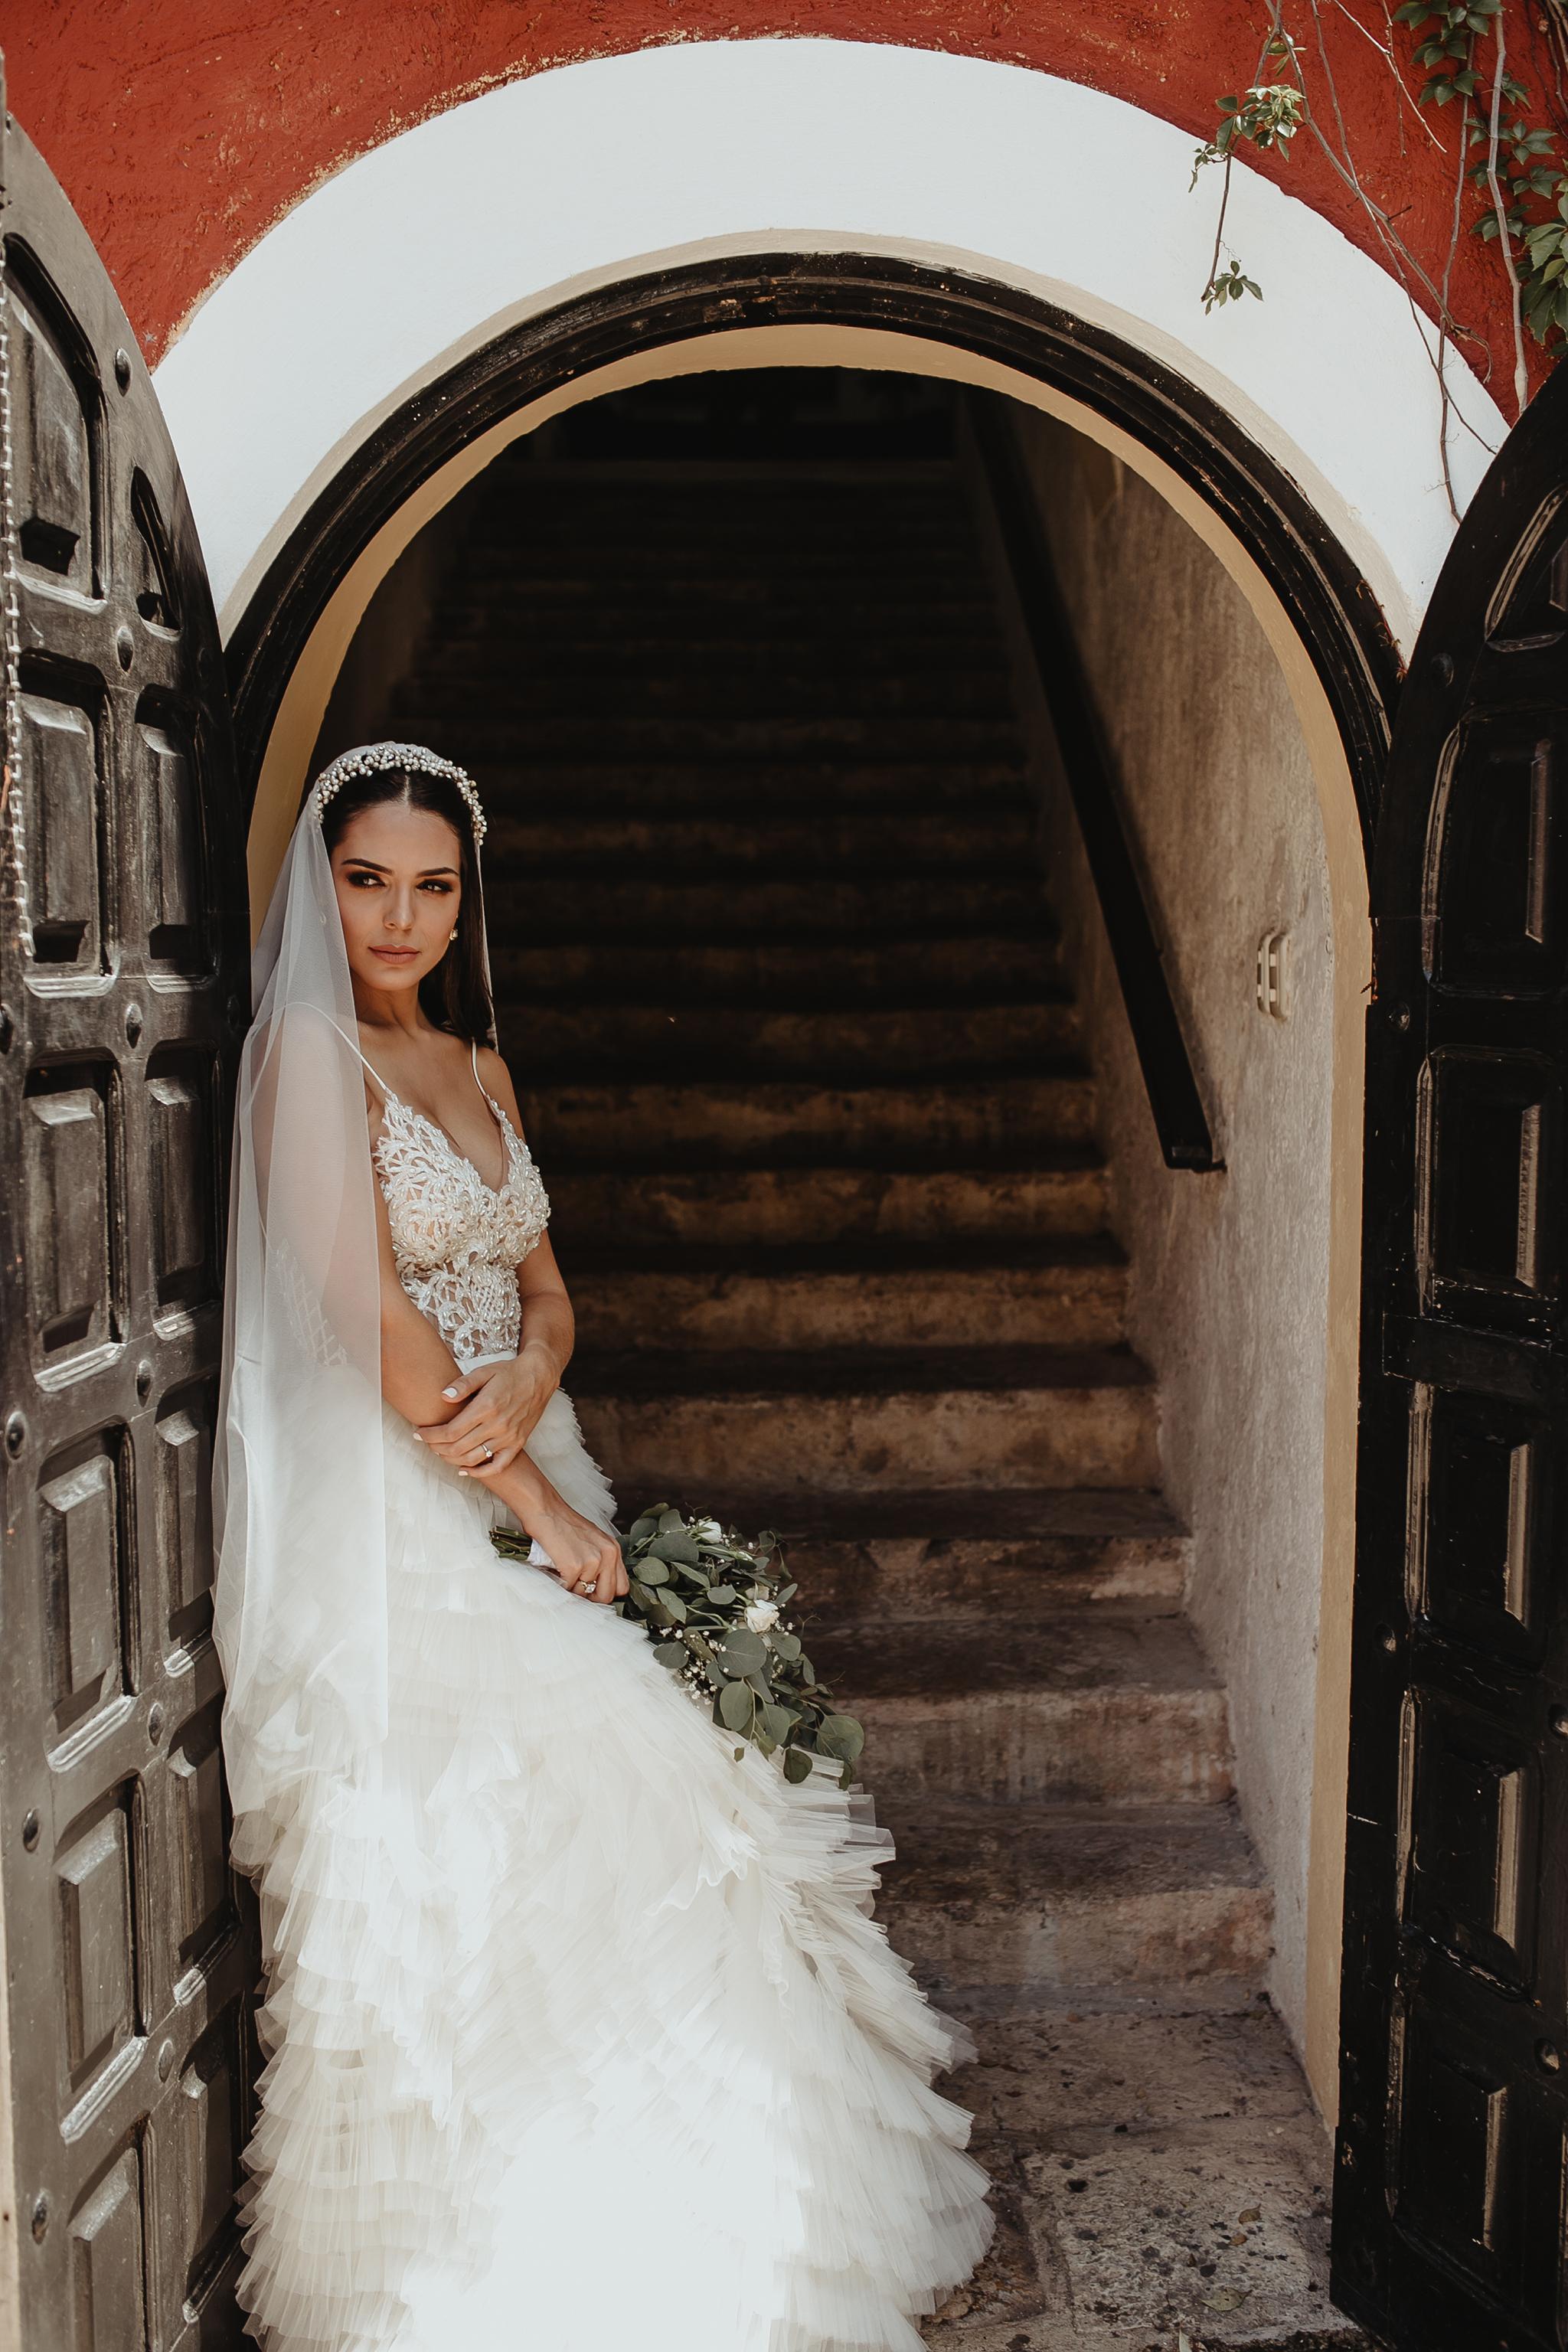 0151R&F__WeddingDestination_Weddingmerida_BodaMexico_FotografoDeBodas_FabrizioSimoneenFotografo.jpg